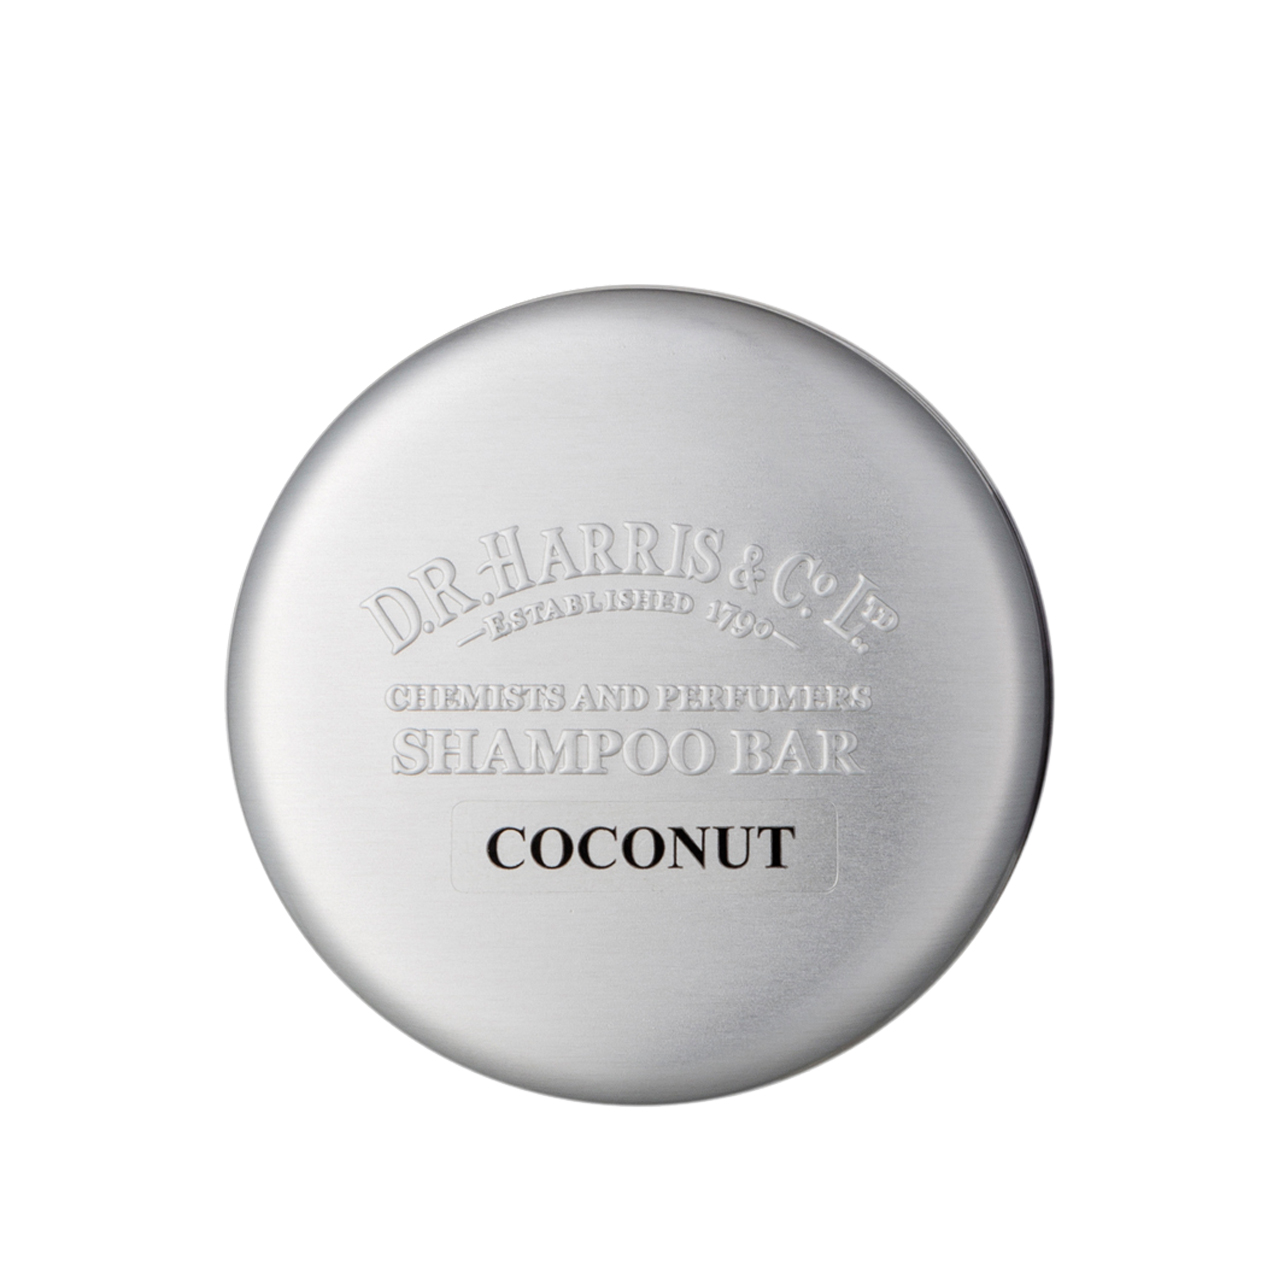 Coconut - Shampoo Bar